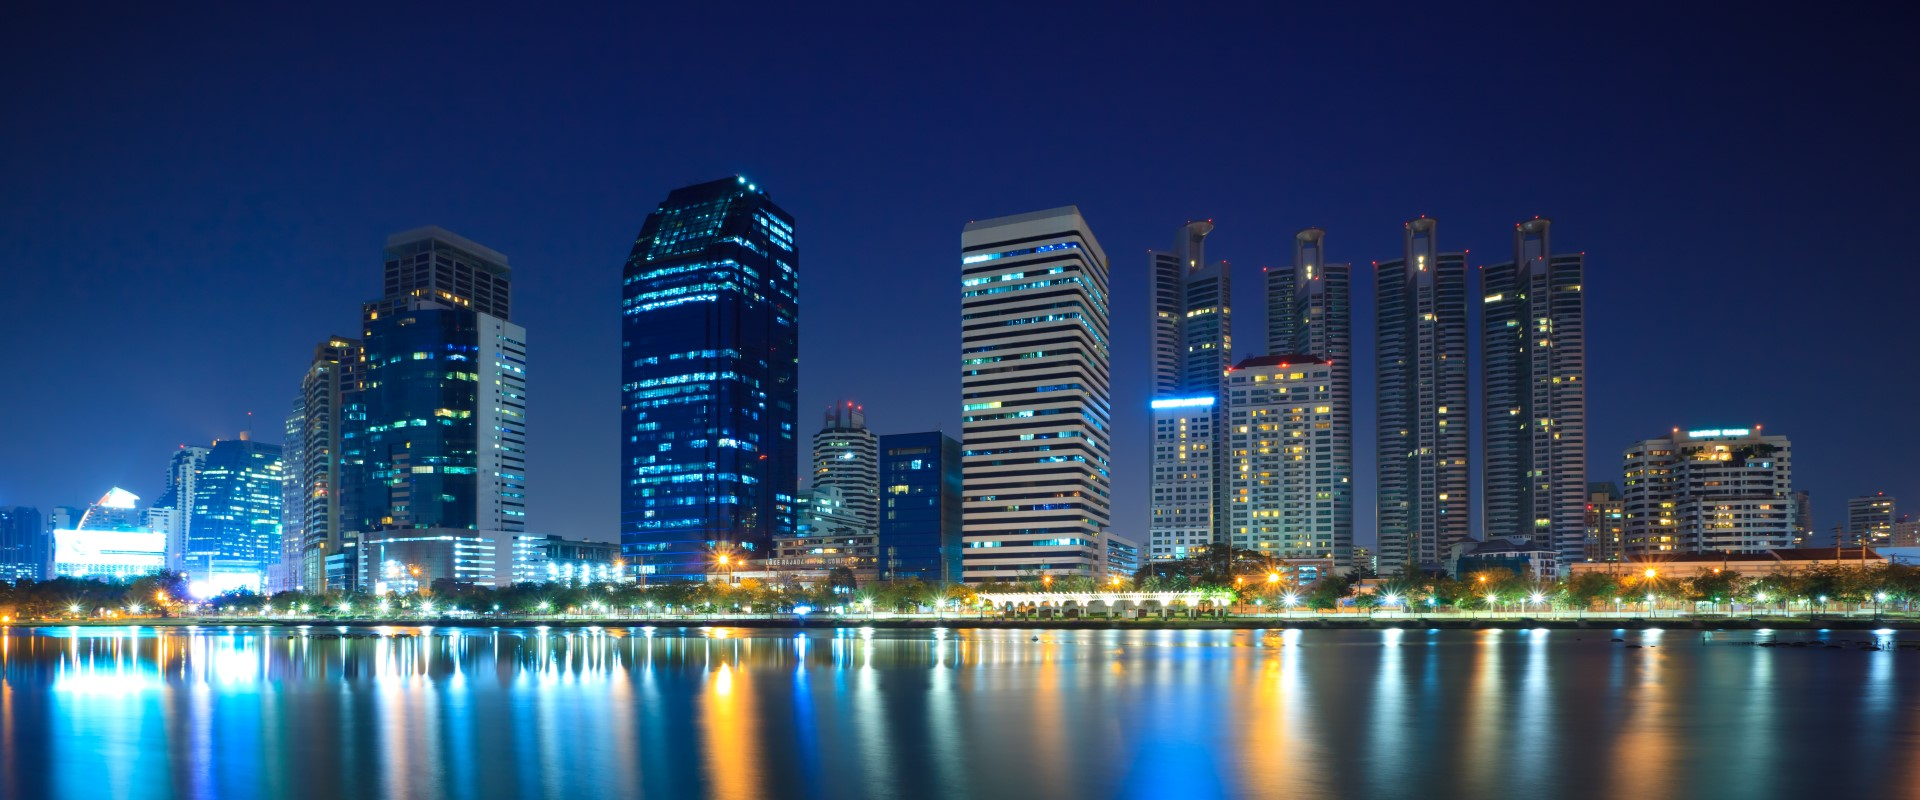 bangkok province city 11